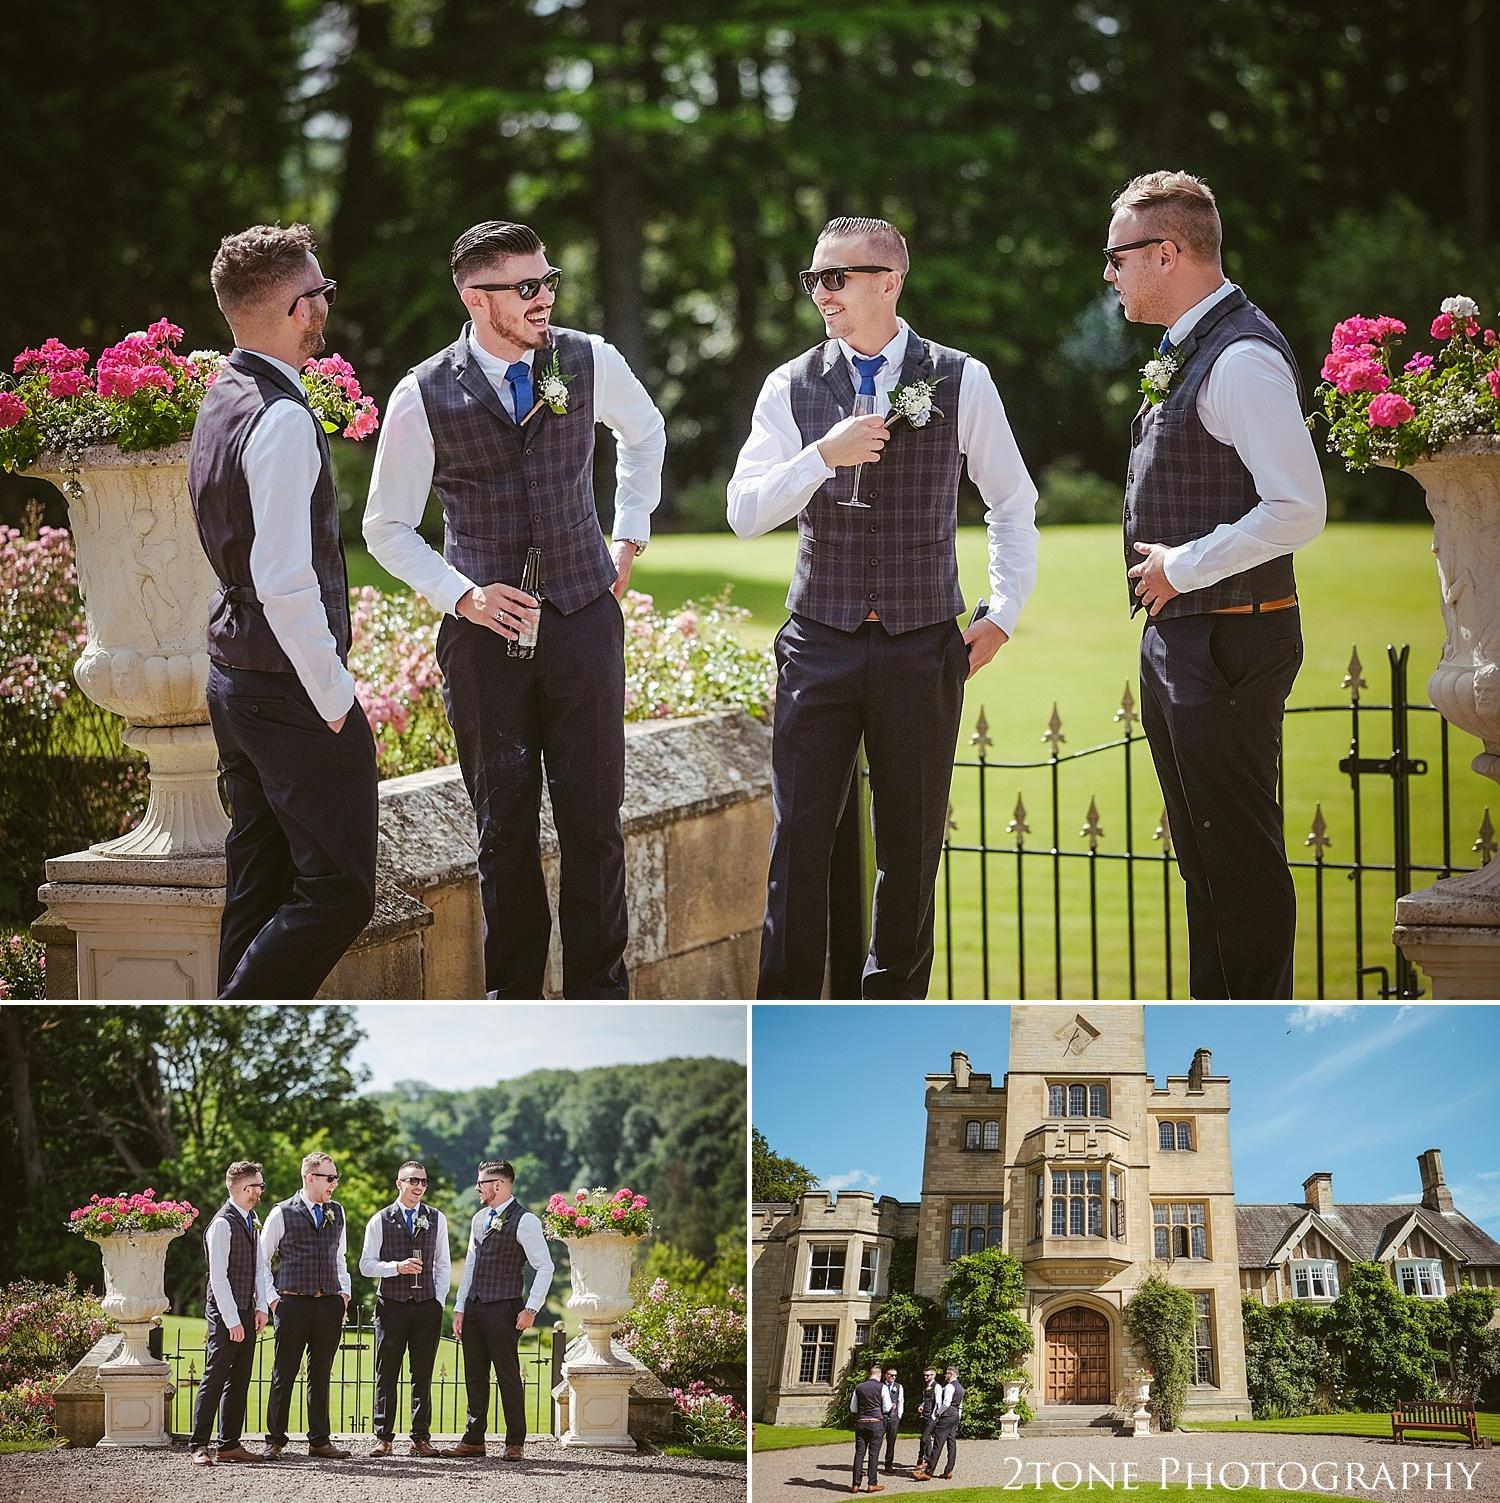 The groom and groomsmen.  Wedding photography at Guyzance Hall by wedding photographers www.2tonephotography.co.uk